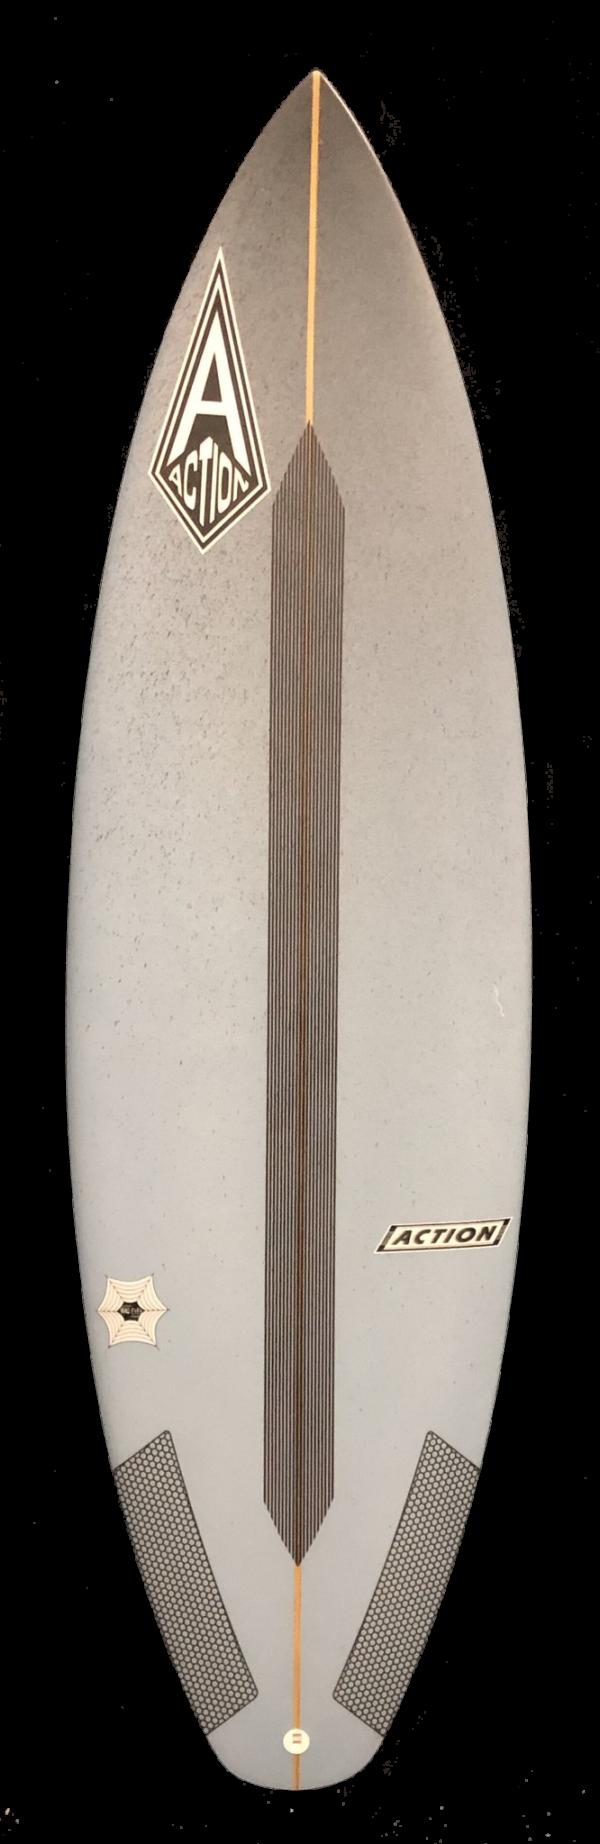 Action Surf Shop - Firebreather Surfboard